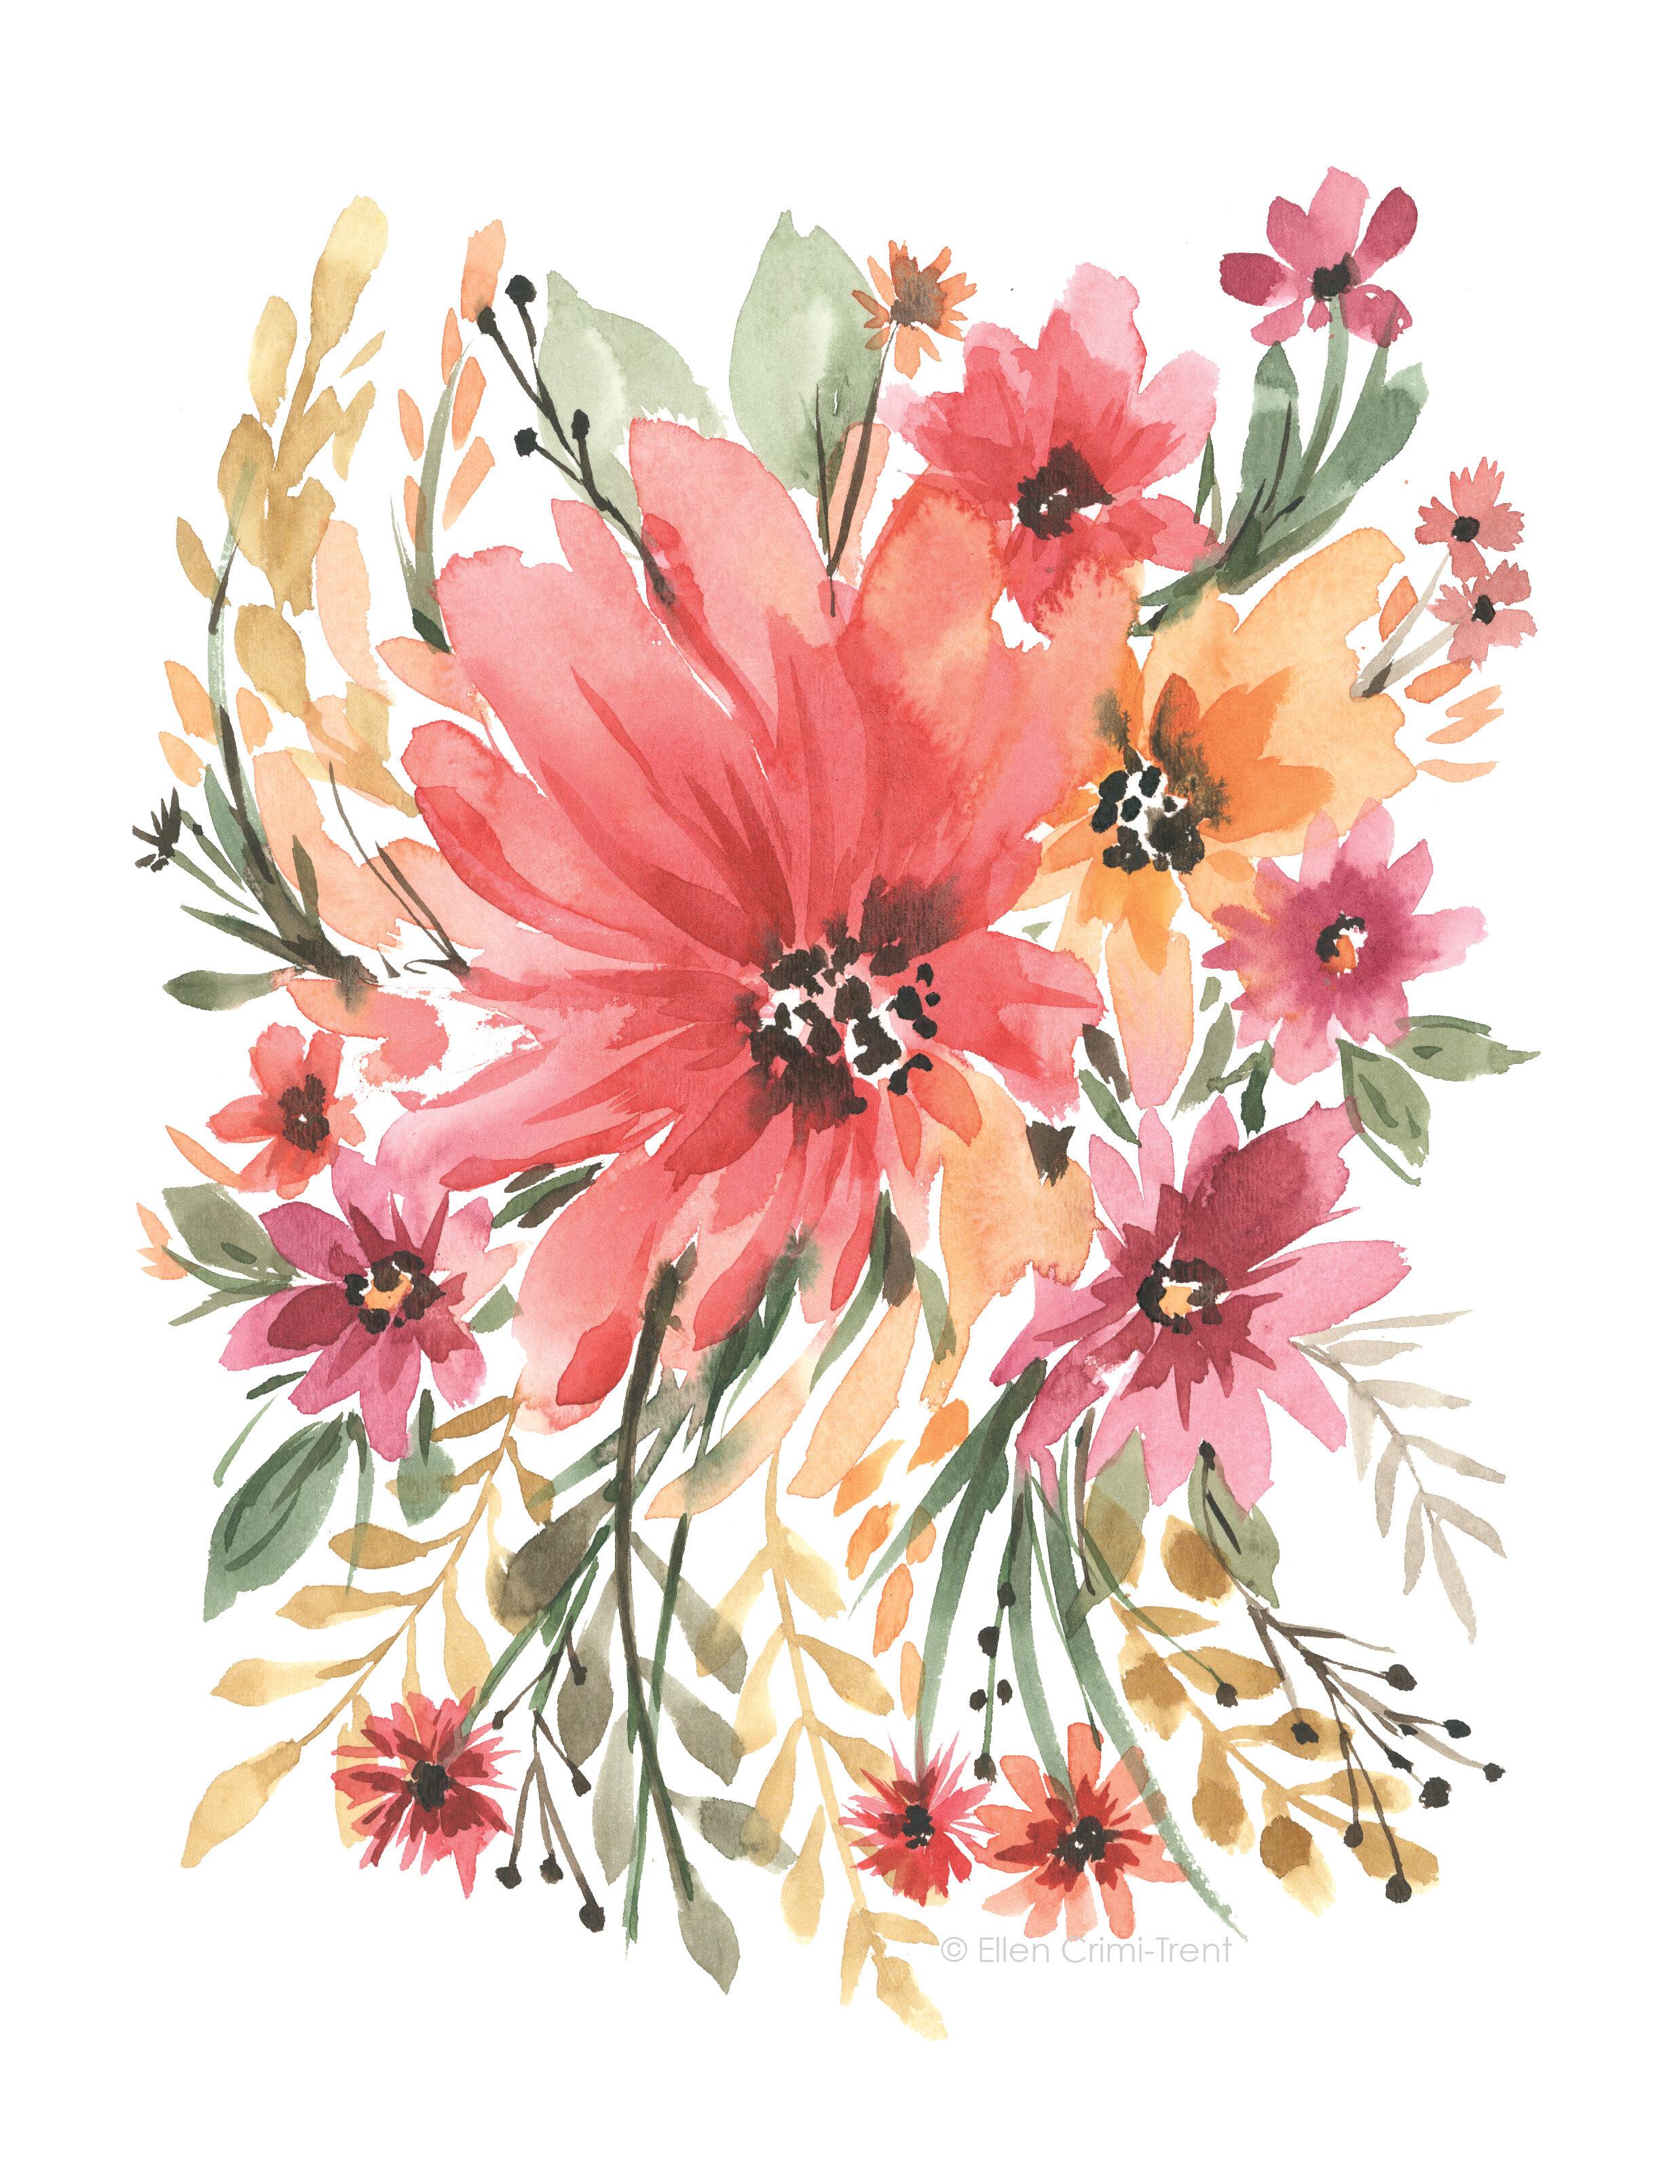 Ellen Crimi Trent Boho Chic Watercolor Floral Painting Print On